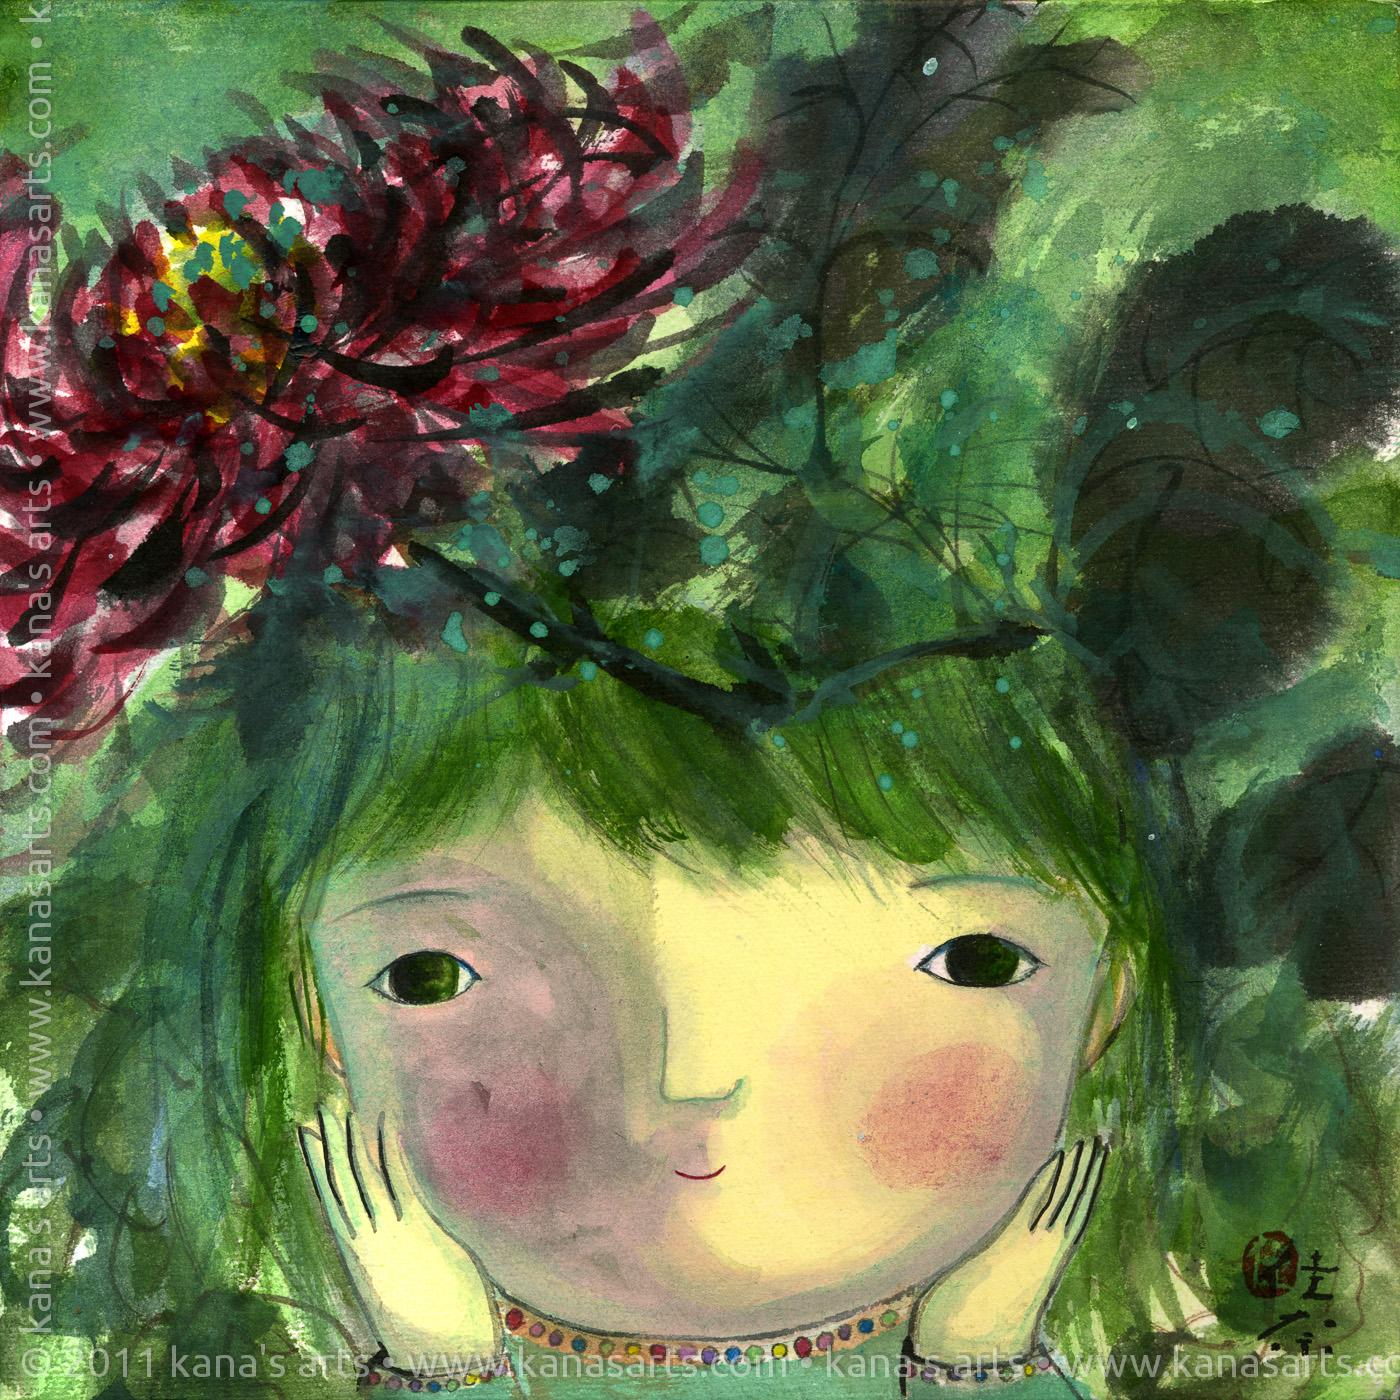 chrysanthemum on my head